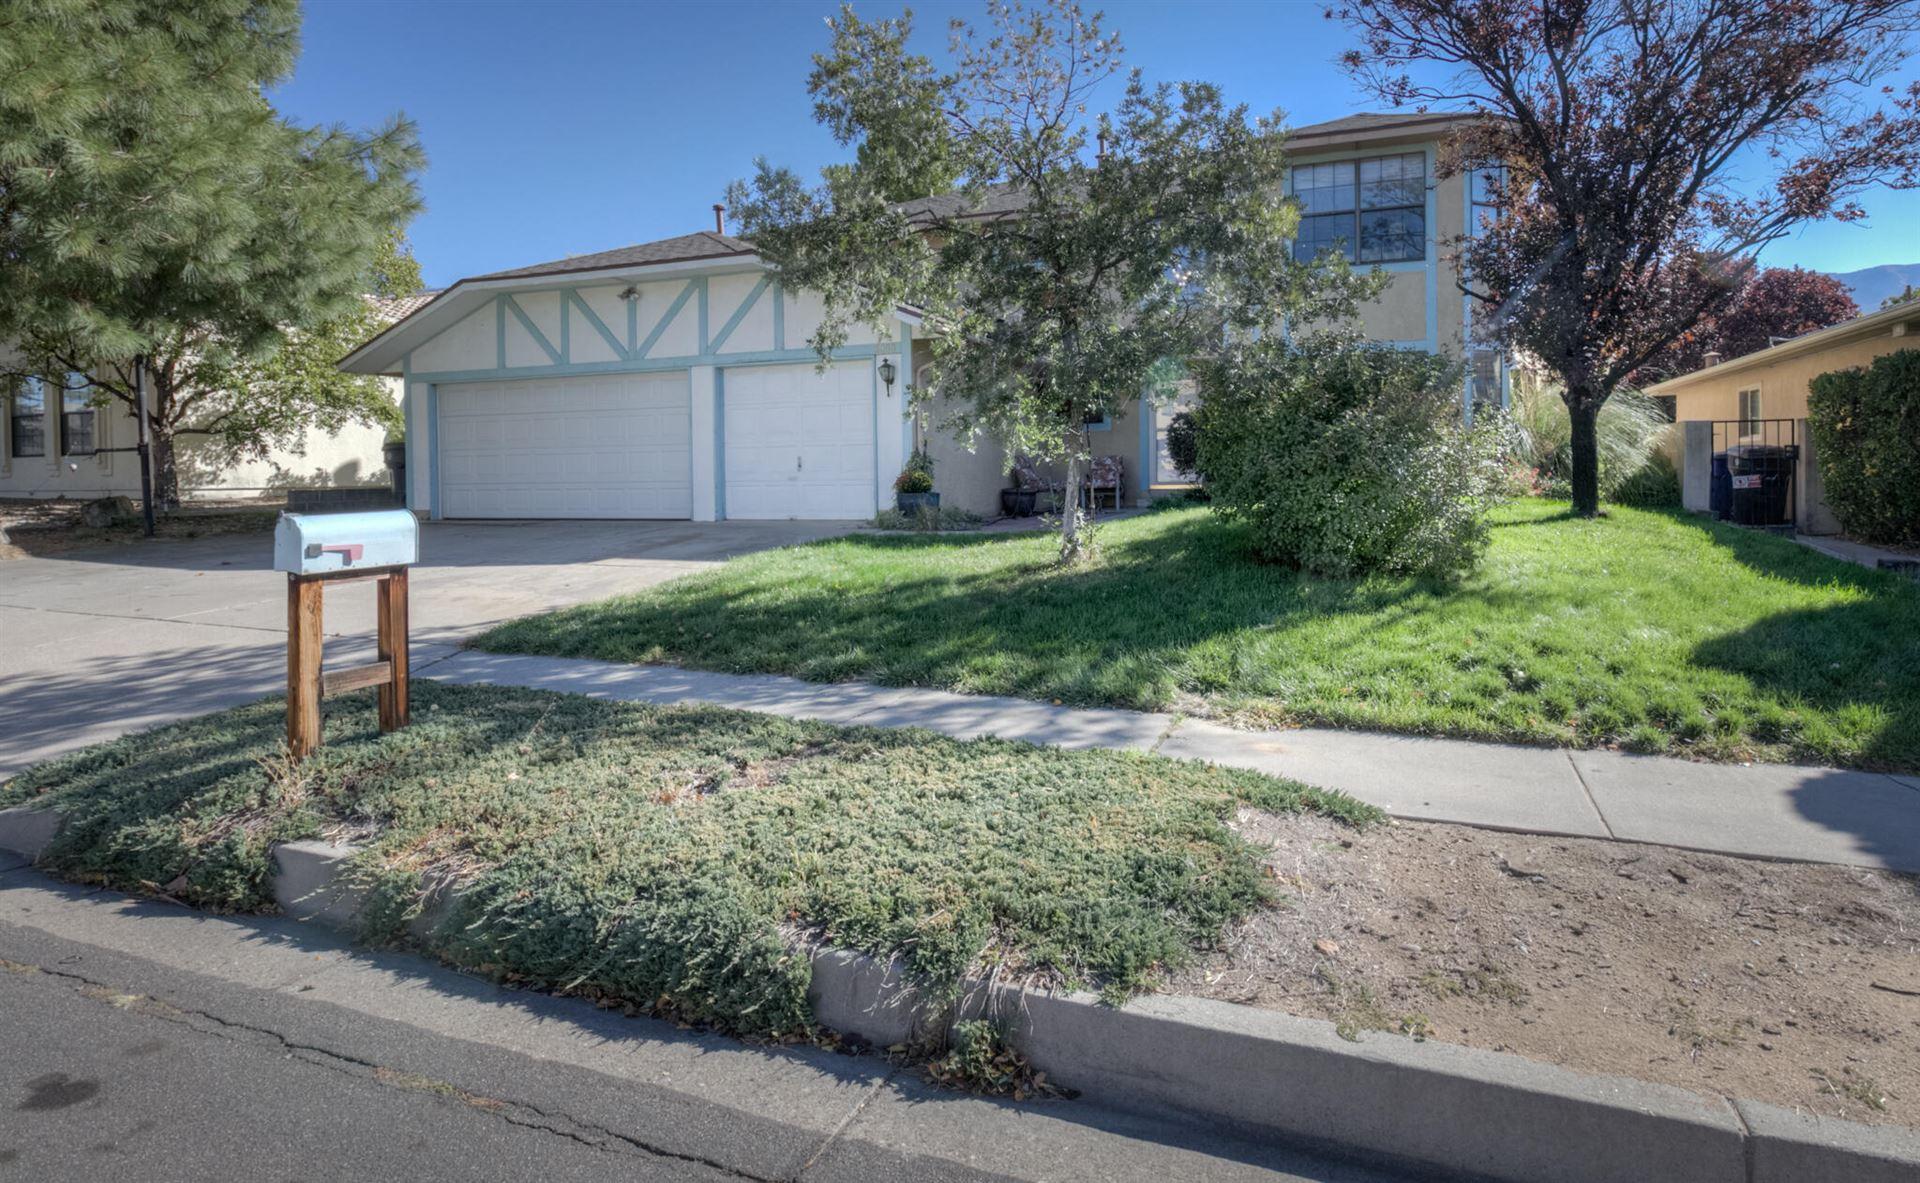 5808 KLONDIKE Street NE, Albuquerque, NM 87111 - MLS#: 1002912